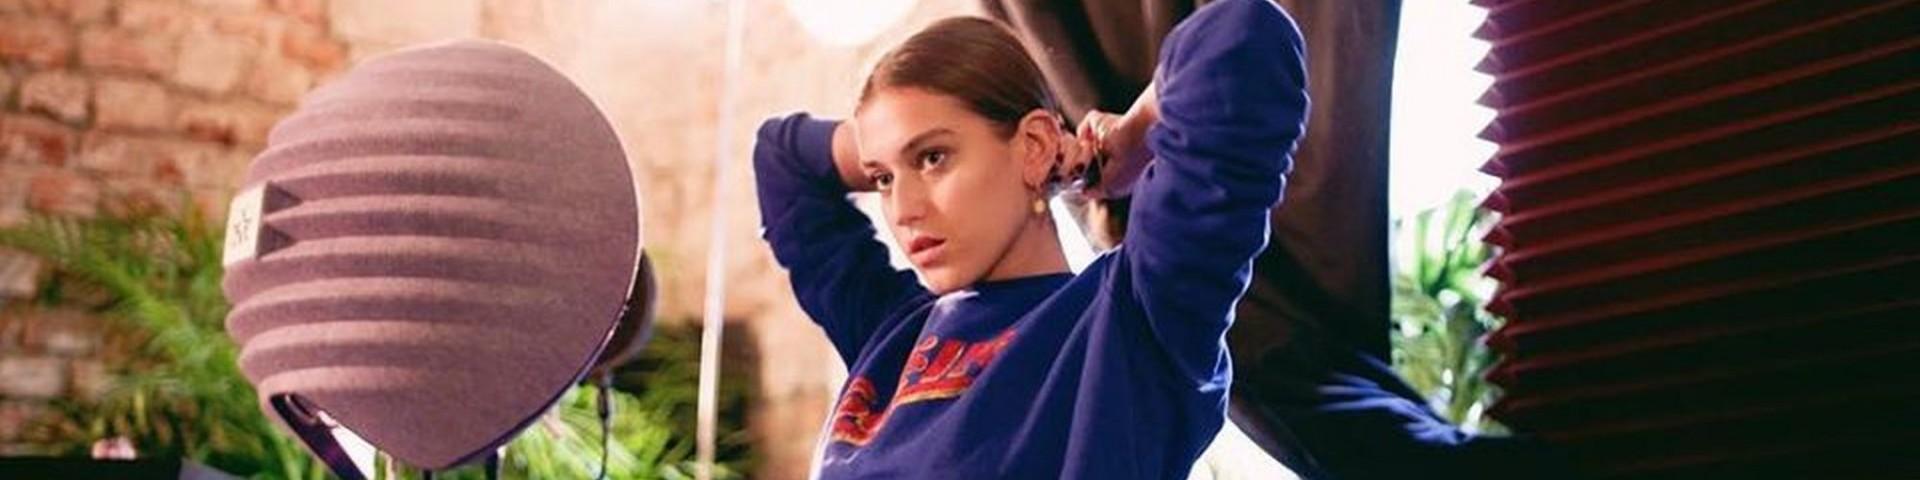 Chi è Gaia Gozzi, da X Factor ad Amici 19